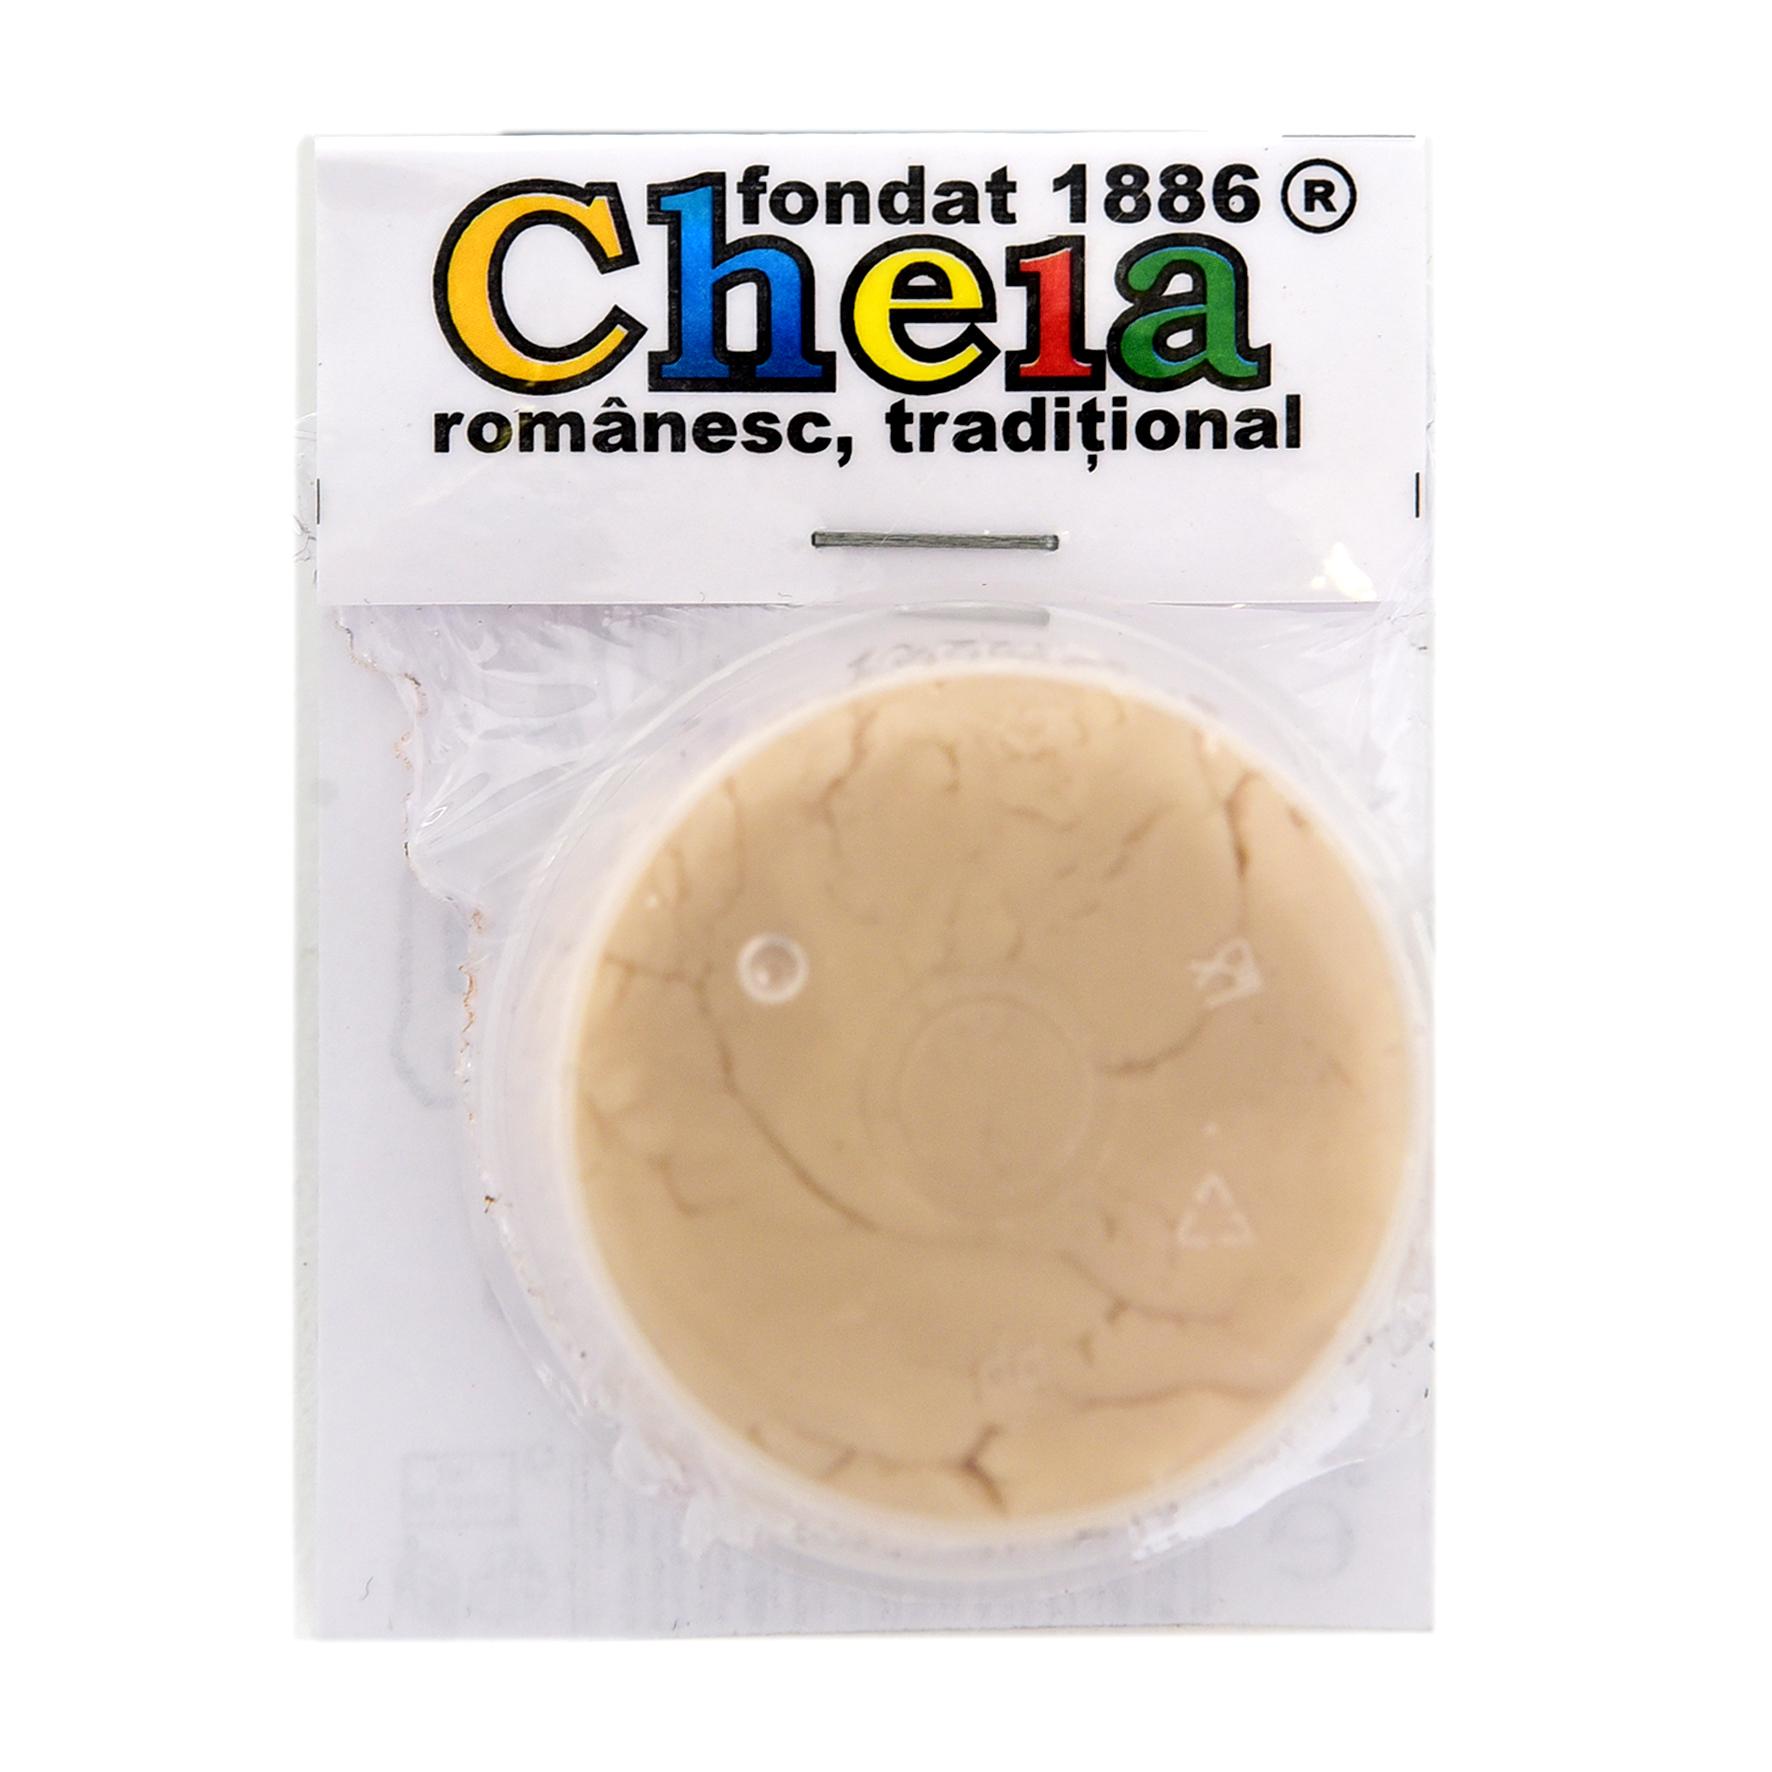 Coco sapun plastilina pentru copii